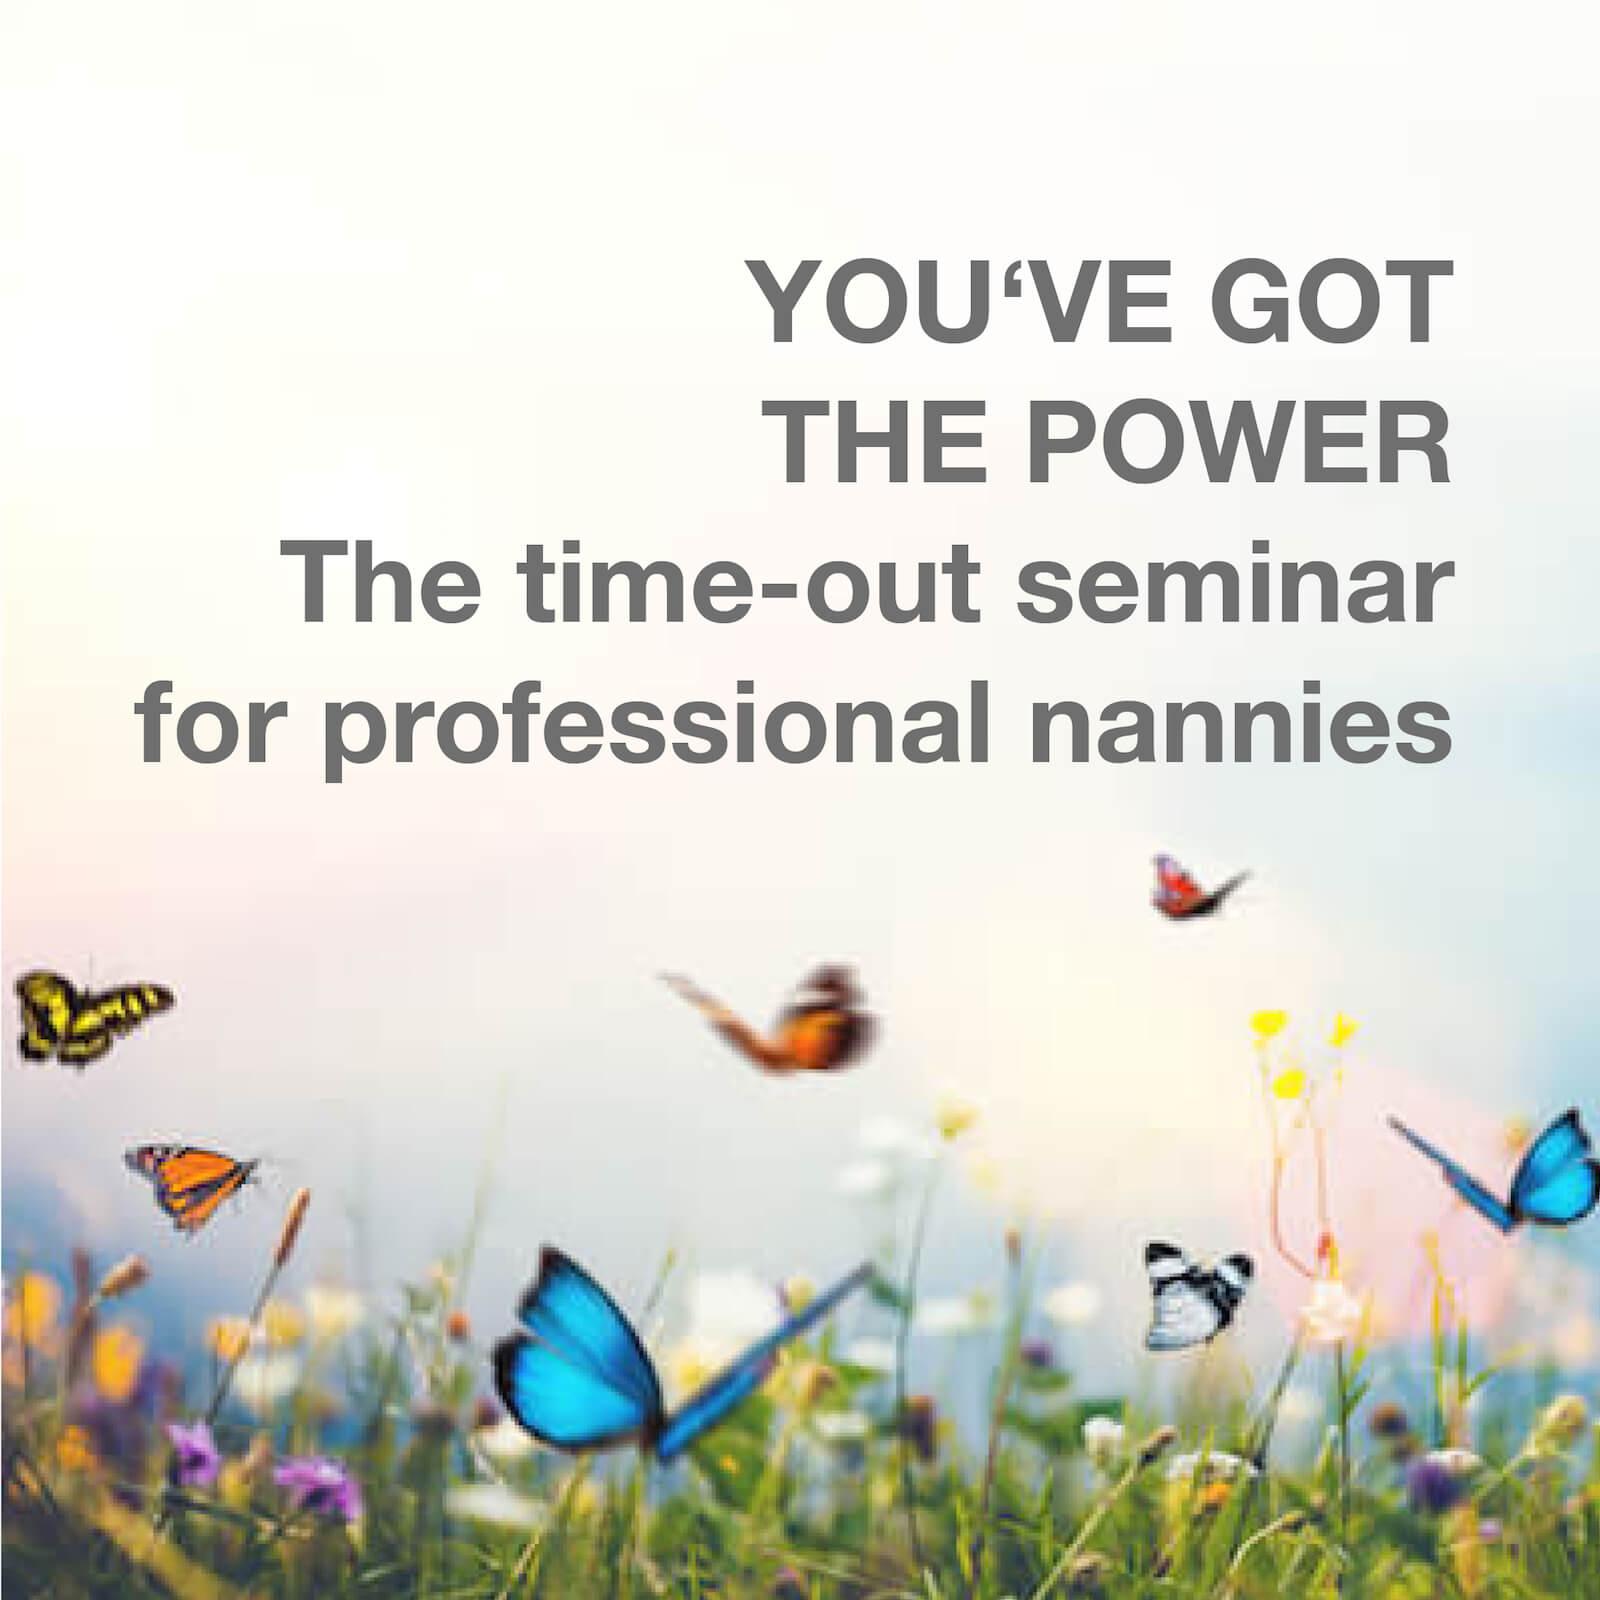 High profile nanny seminar to be back at full strenght.